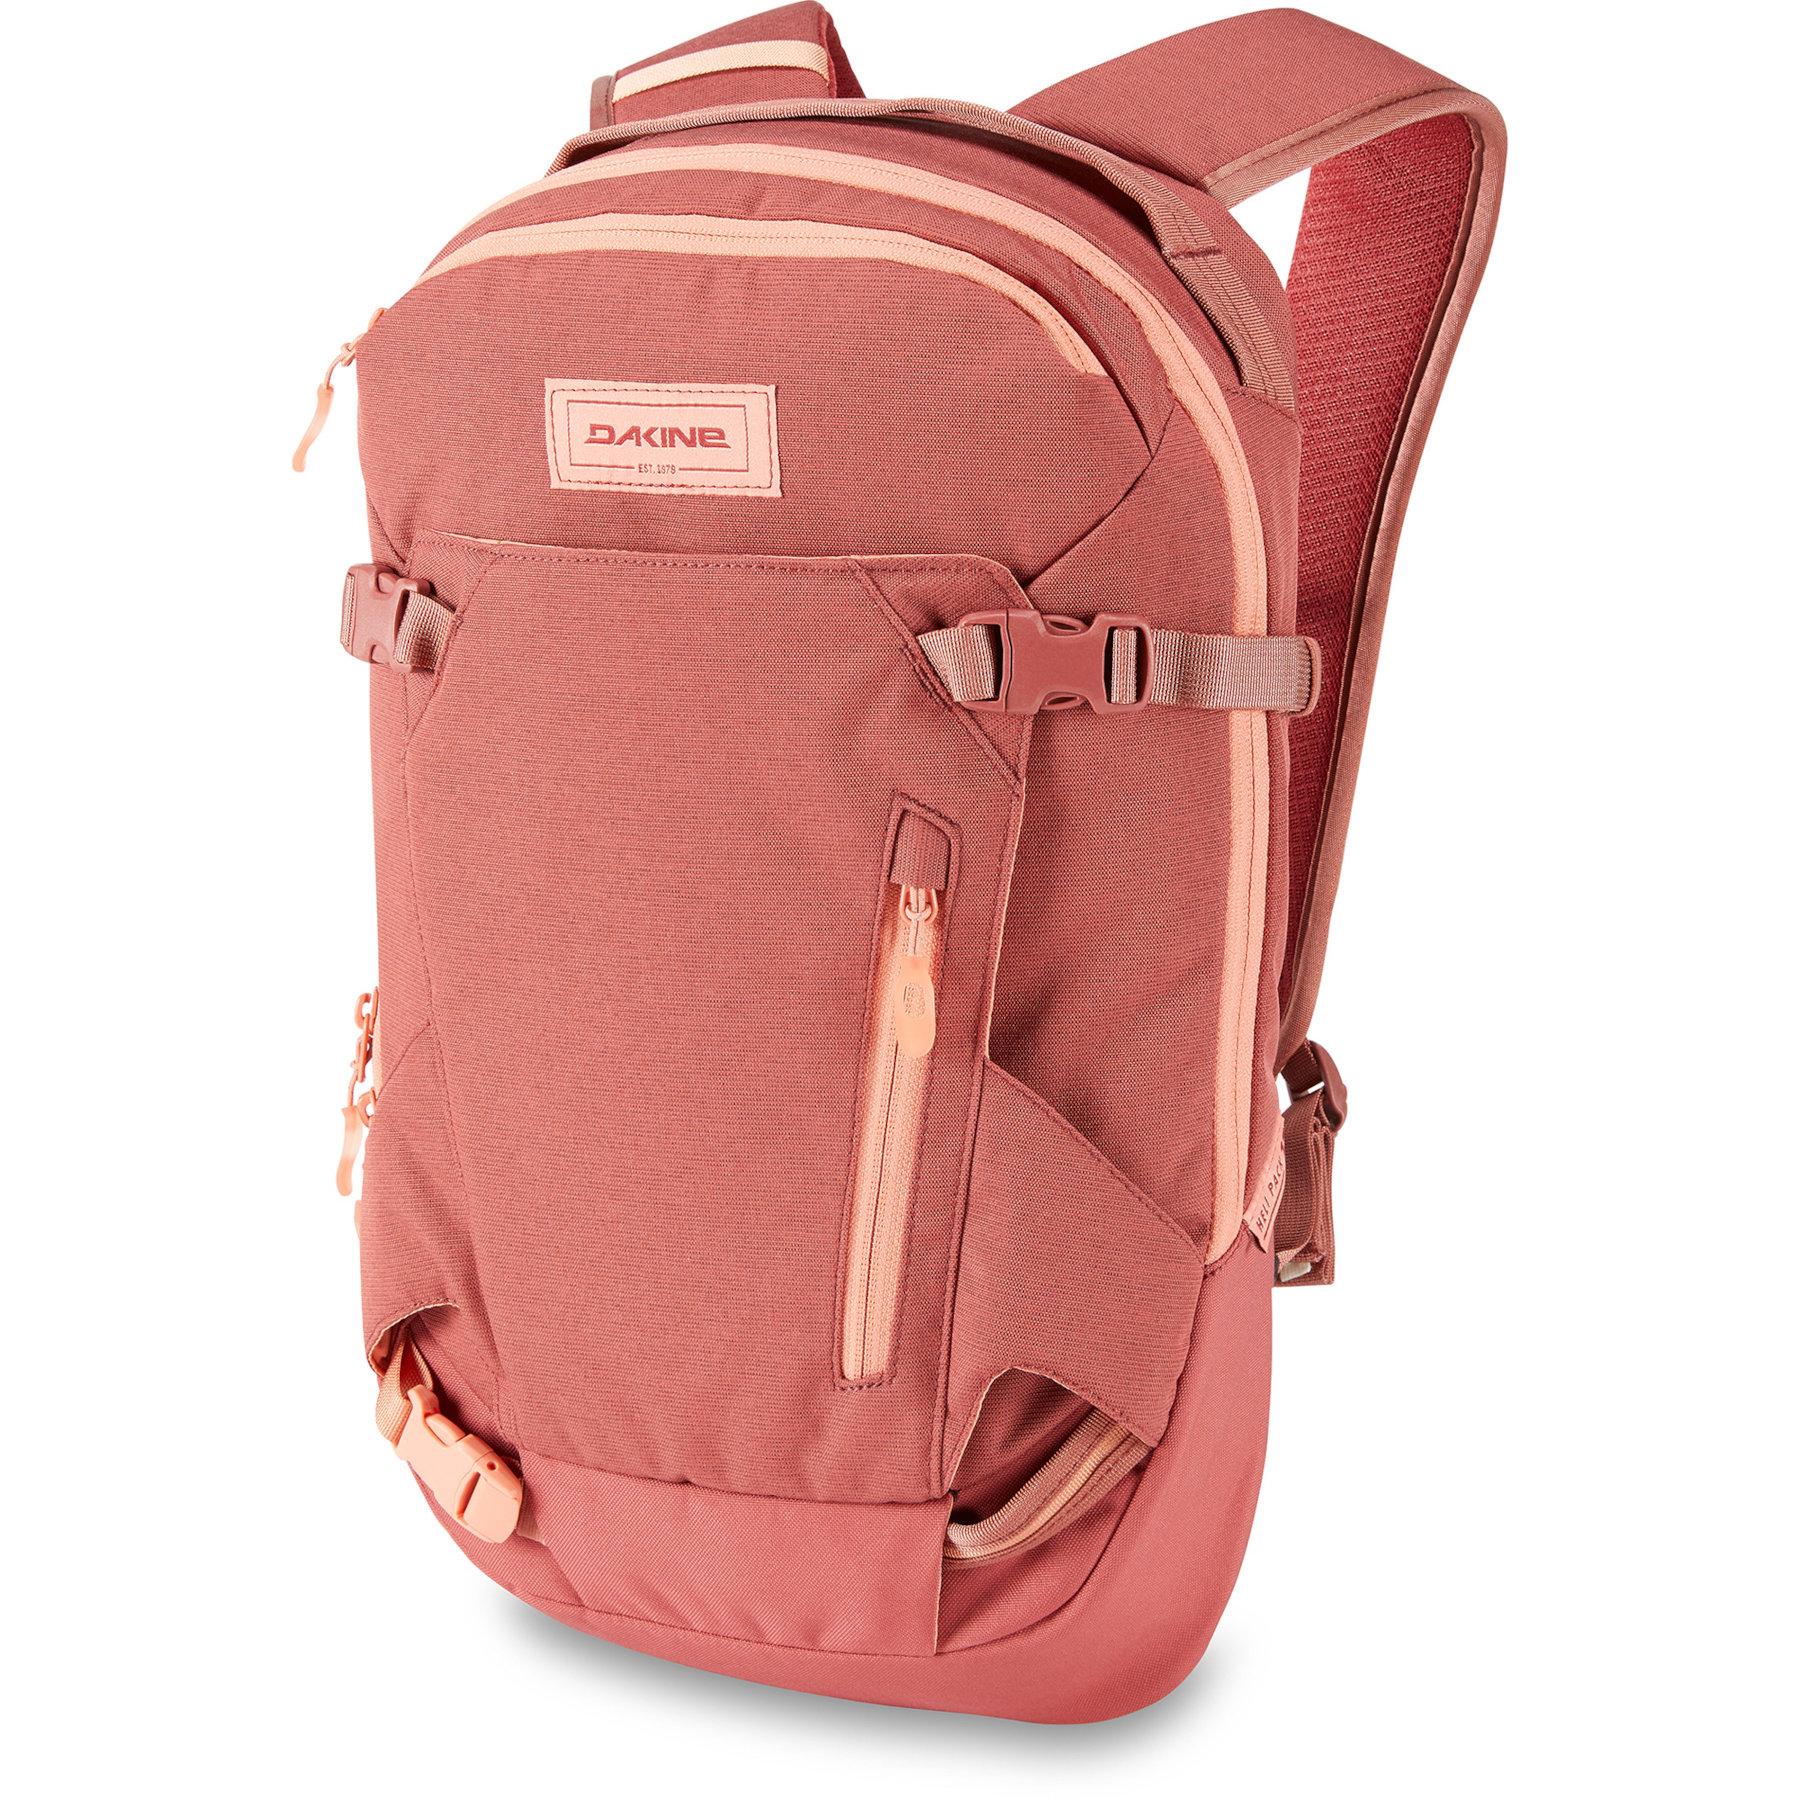 Dakine Women's Heli Pack 12L Backpack - Dark Rose